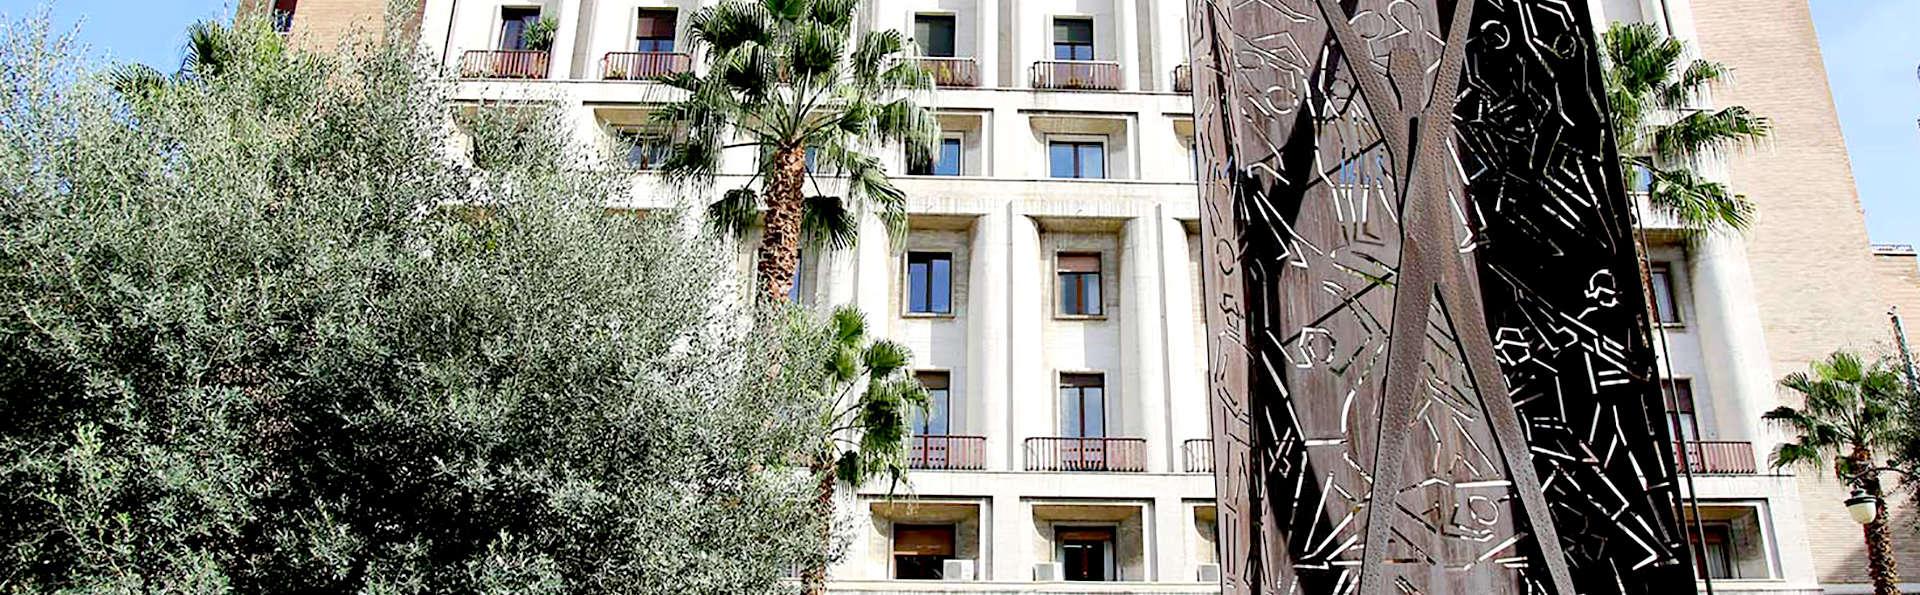 Boutique Hotel Piazza Carità - Edit_Front.jpg